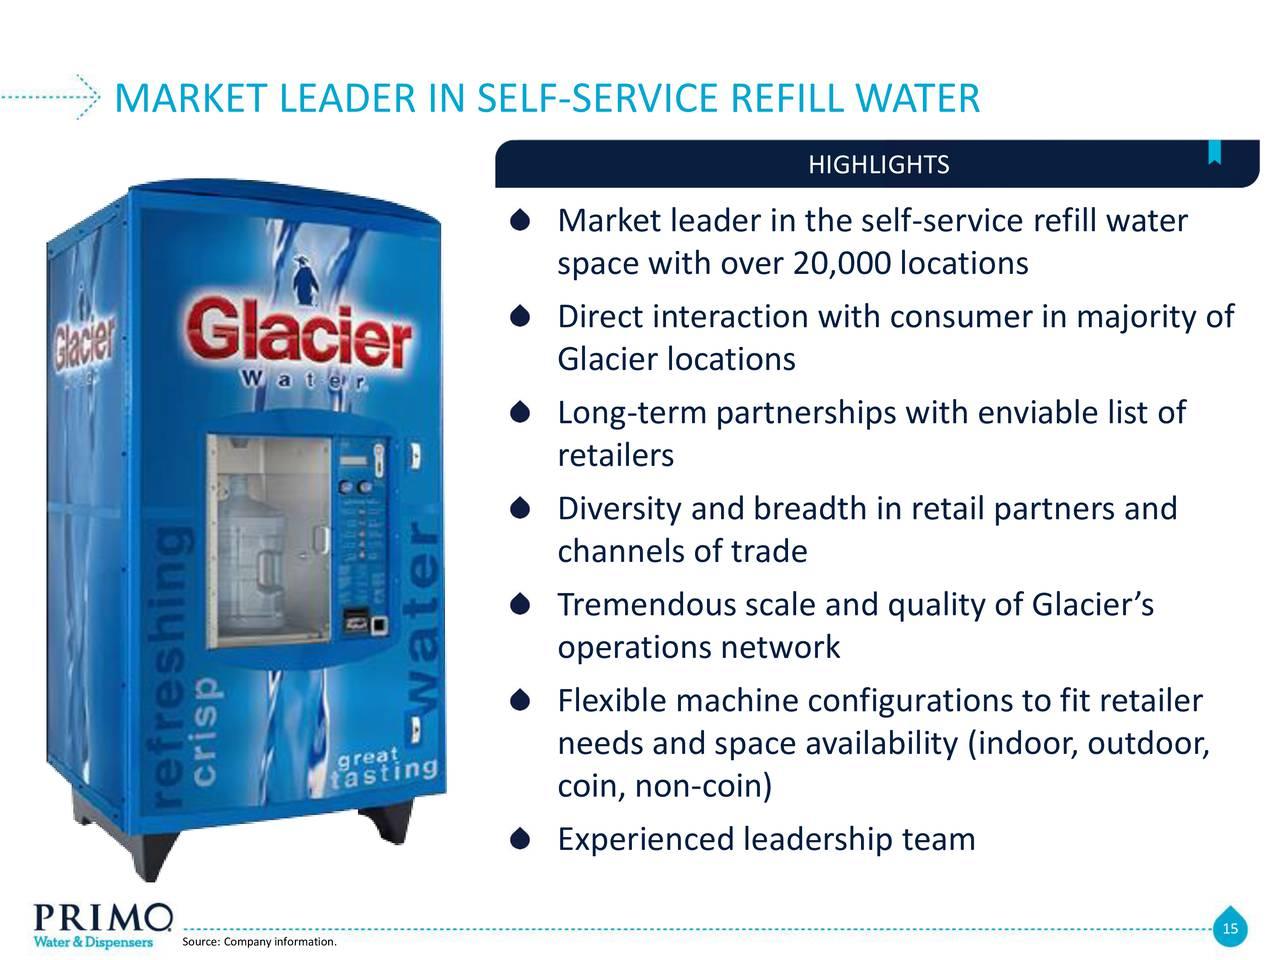 Primo Water (PRMW) Investor Presentation - Slideshow - Primo